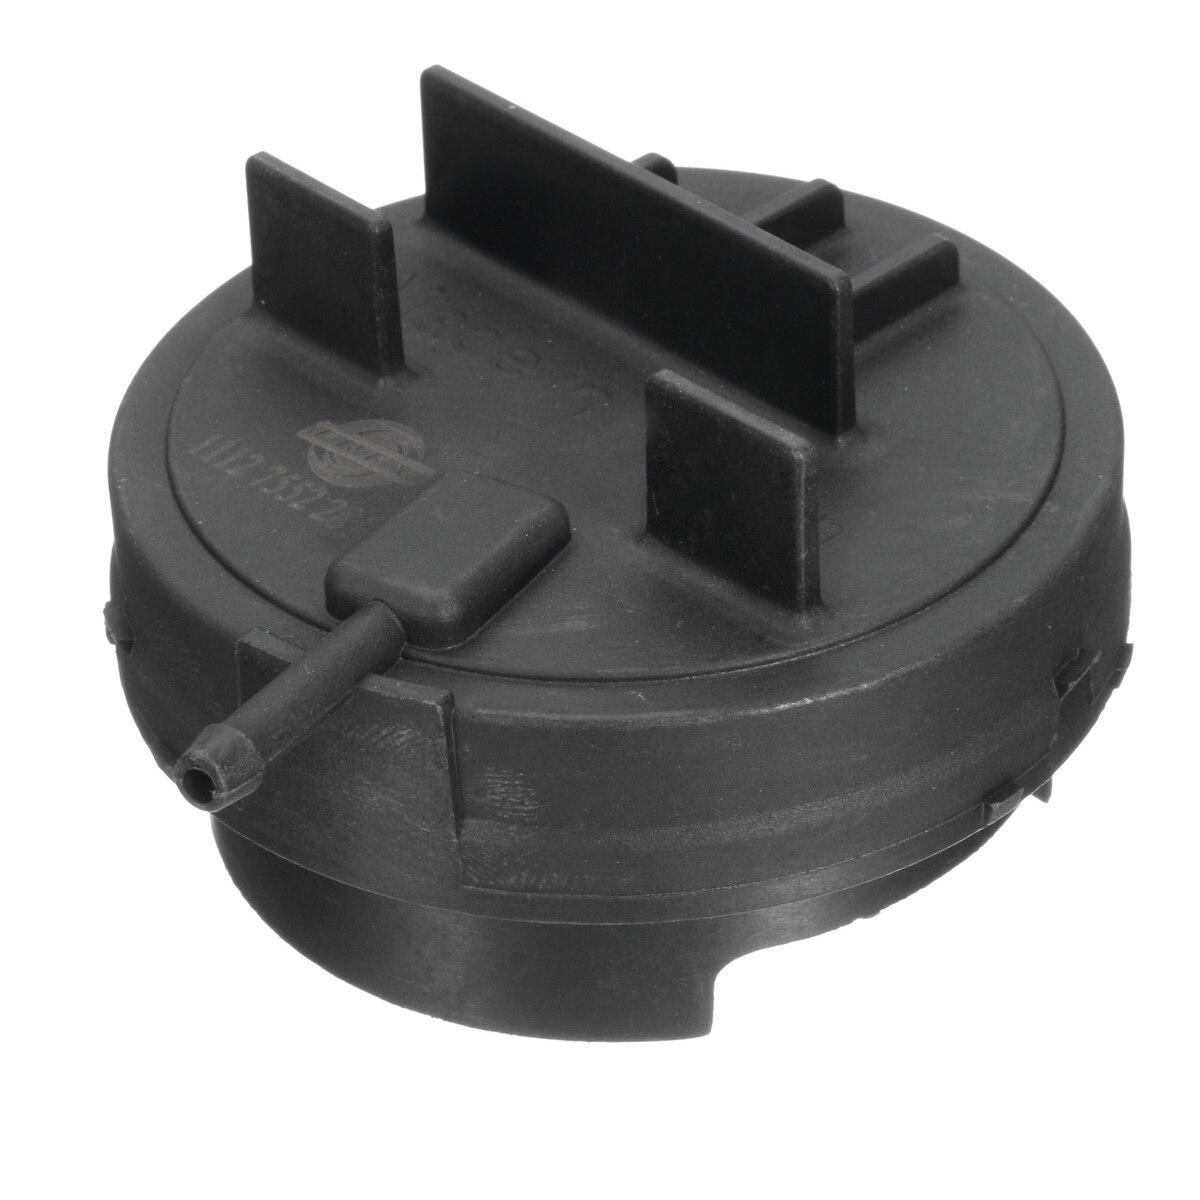 Крышка клапанного блока для двигателя BMW N52 E60 E65 E66 E70 E91 11127552281